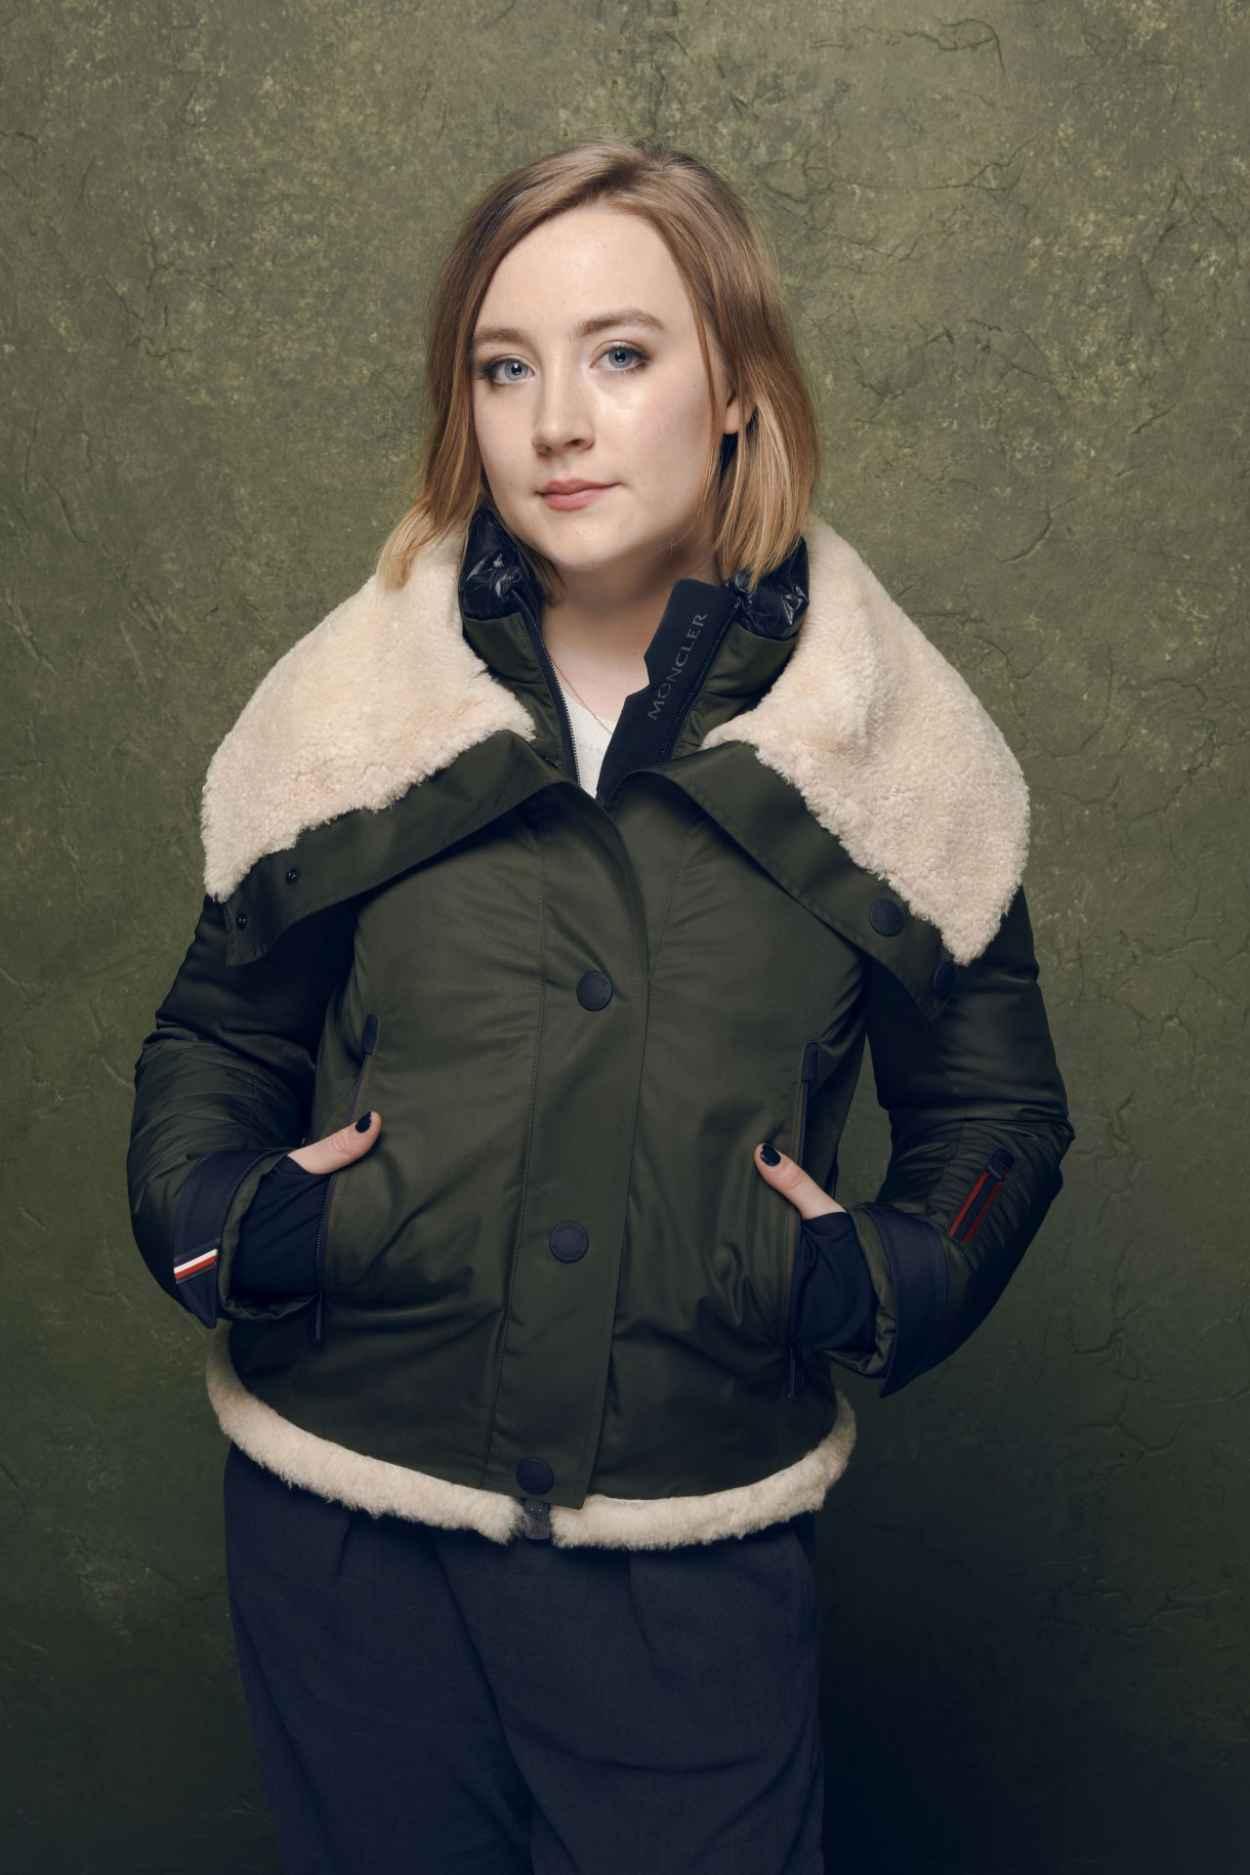 Saoirse Ronan - Brooklyn Portraits at Sundance 2015 in Park City-1